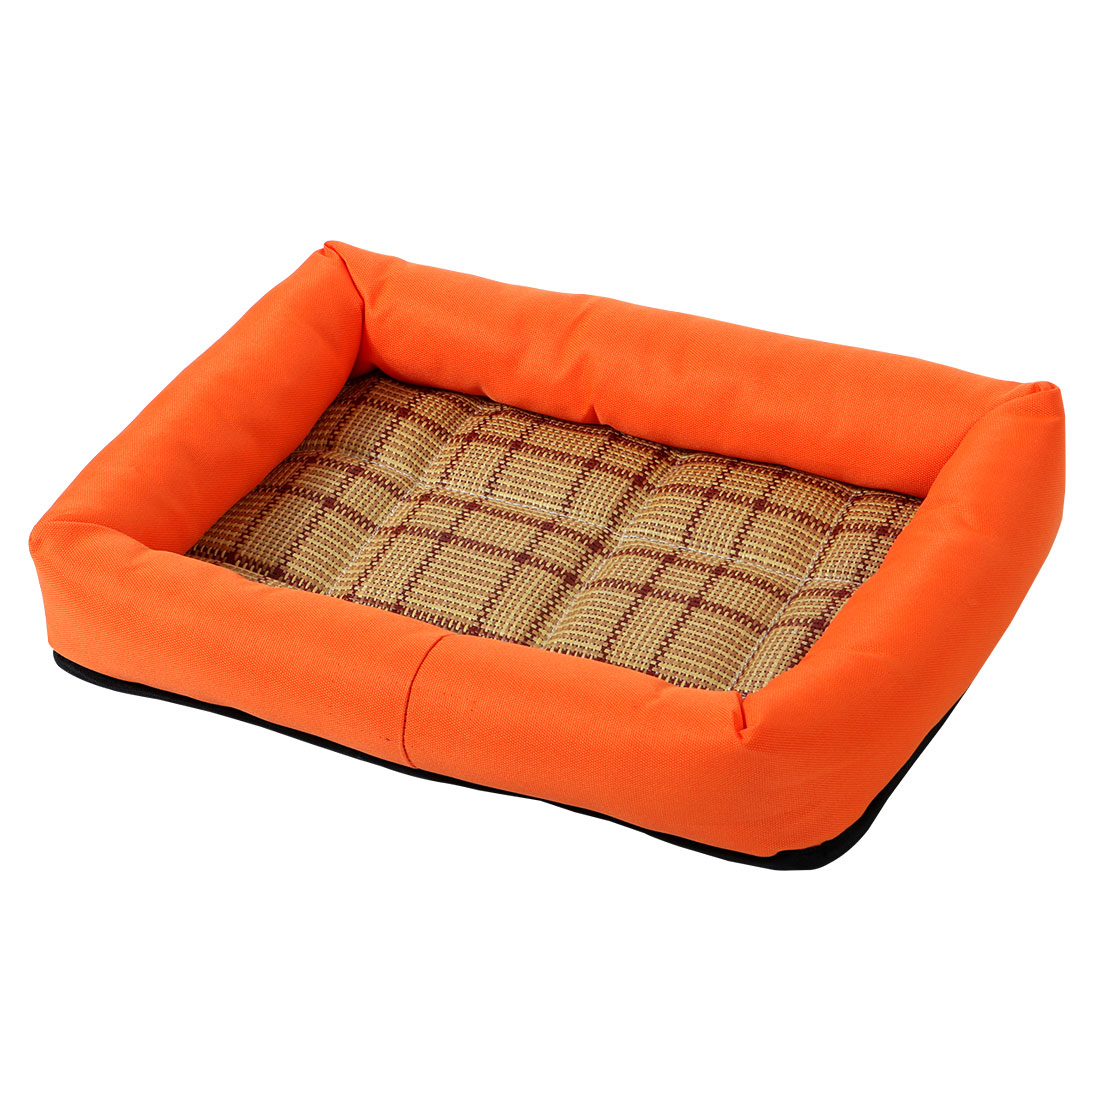 Unique Bargains Summer Cool Heat Resistant Bamboo Dog Cushion Pet Cat Sleeping Bed Mat S Orange